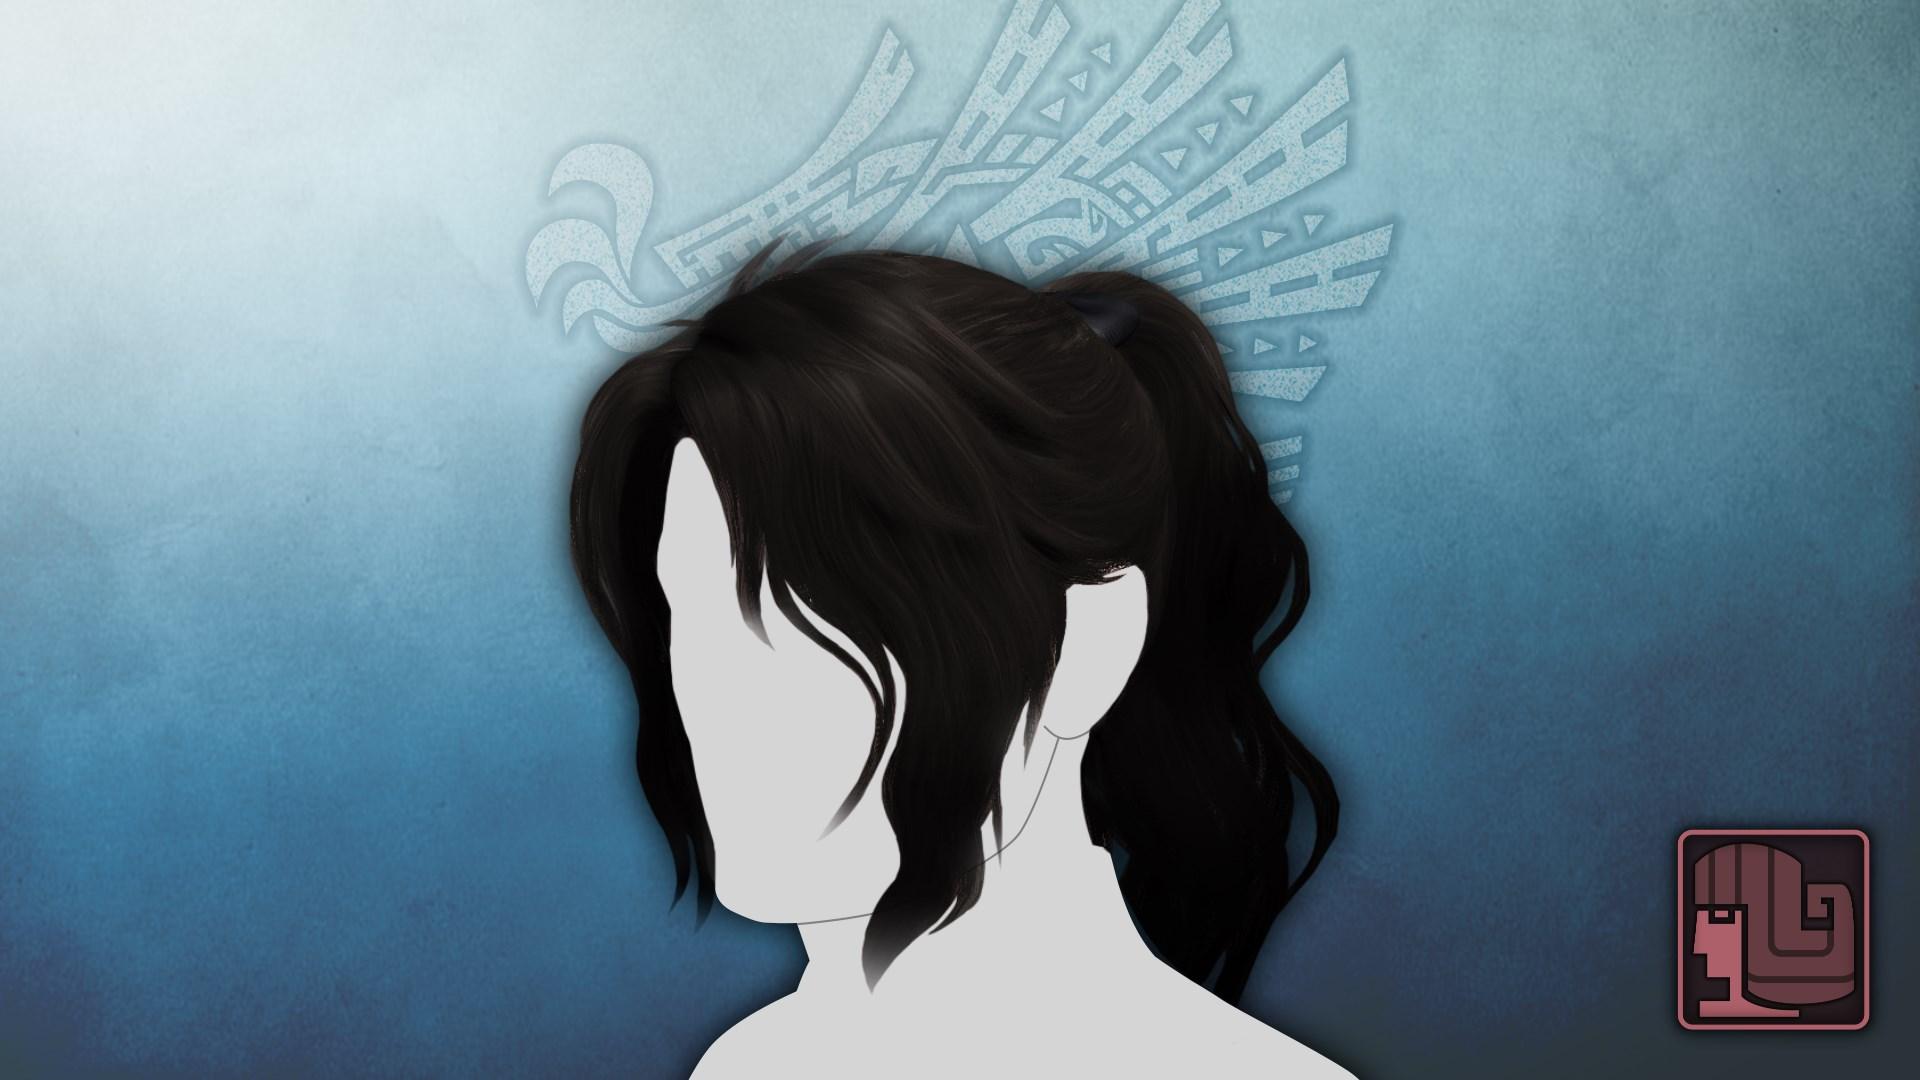 Hairstyle: Mysterious Samurai